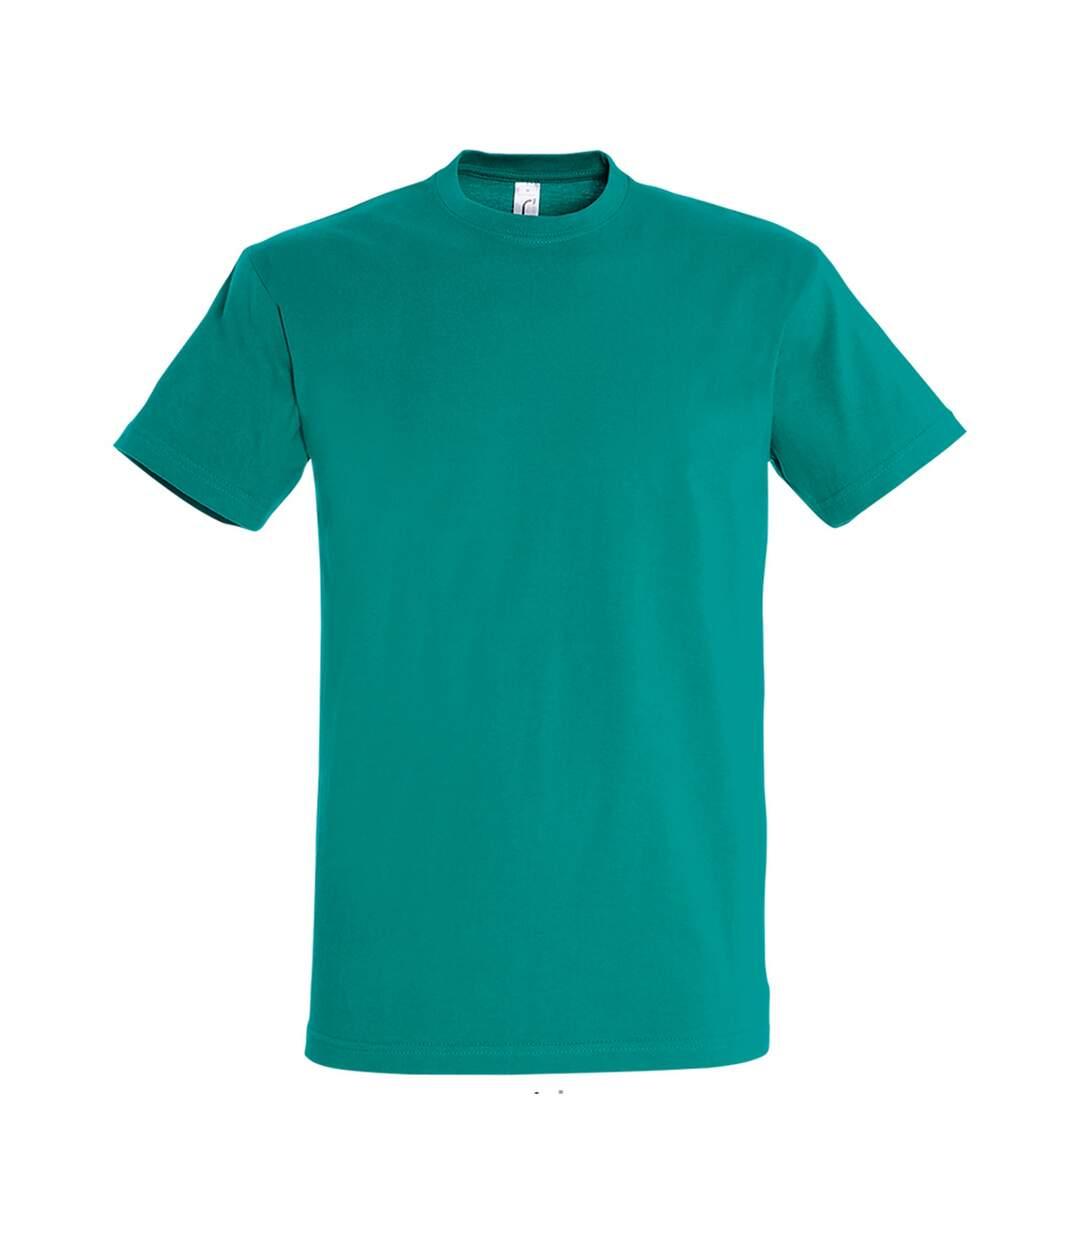 SOLS Mens Imperial Heavyweight Short Sleeve T-Shirt (Emerald) - UTPC290